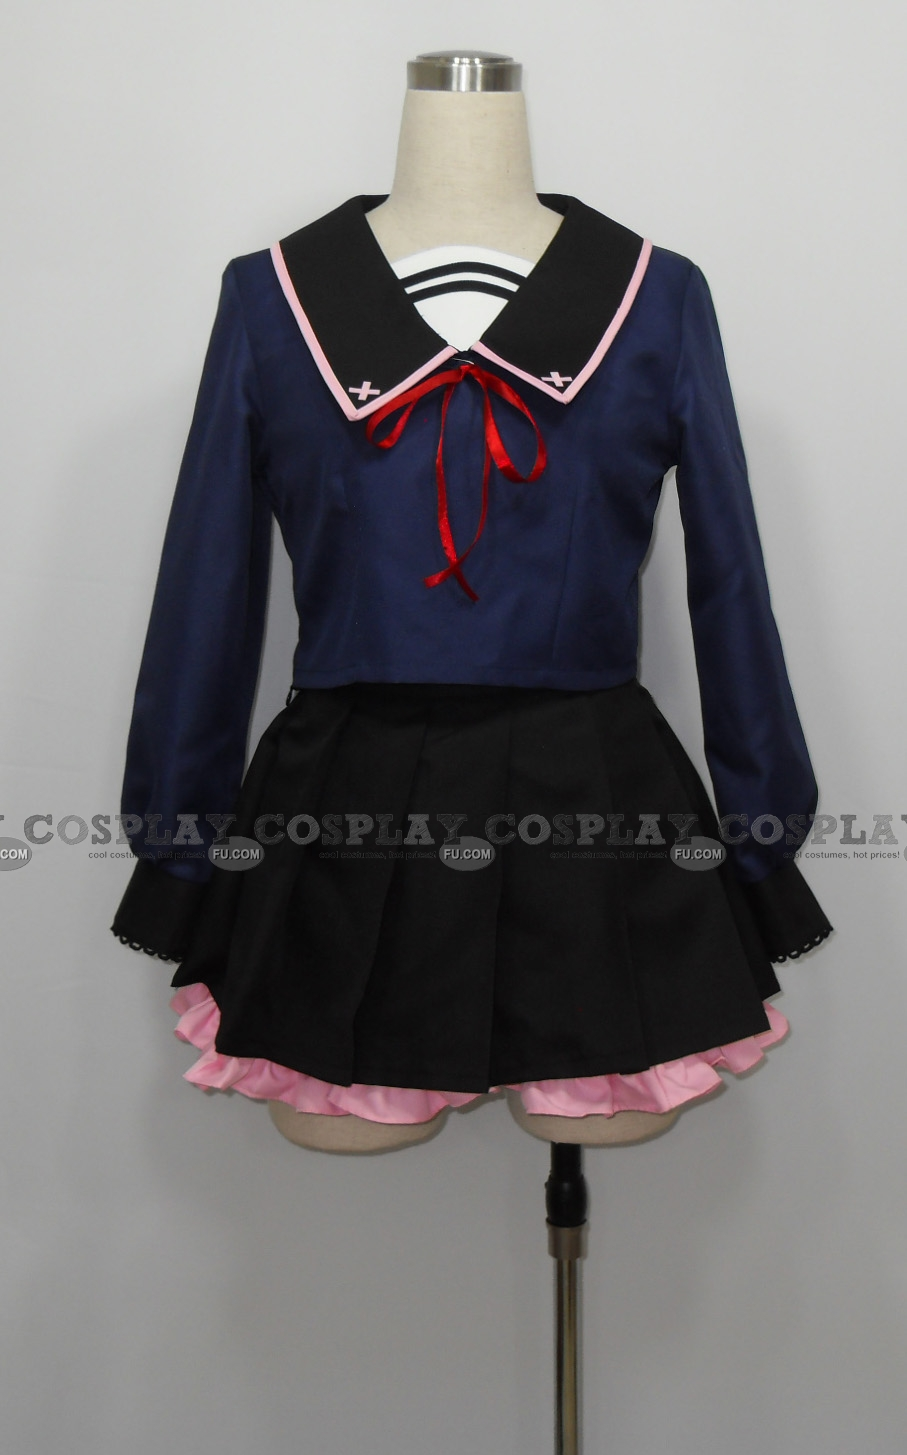 Uzuki Cosplay Costume from Kantai Collection